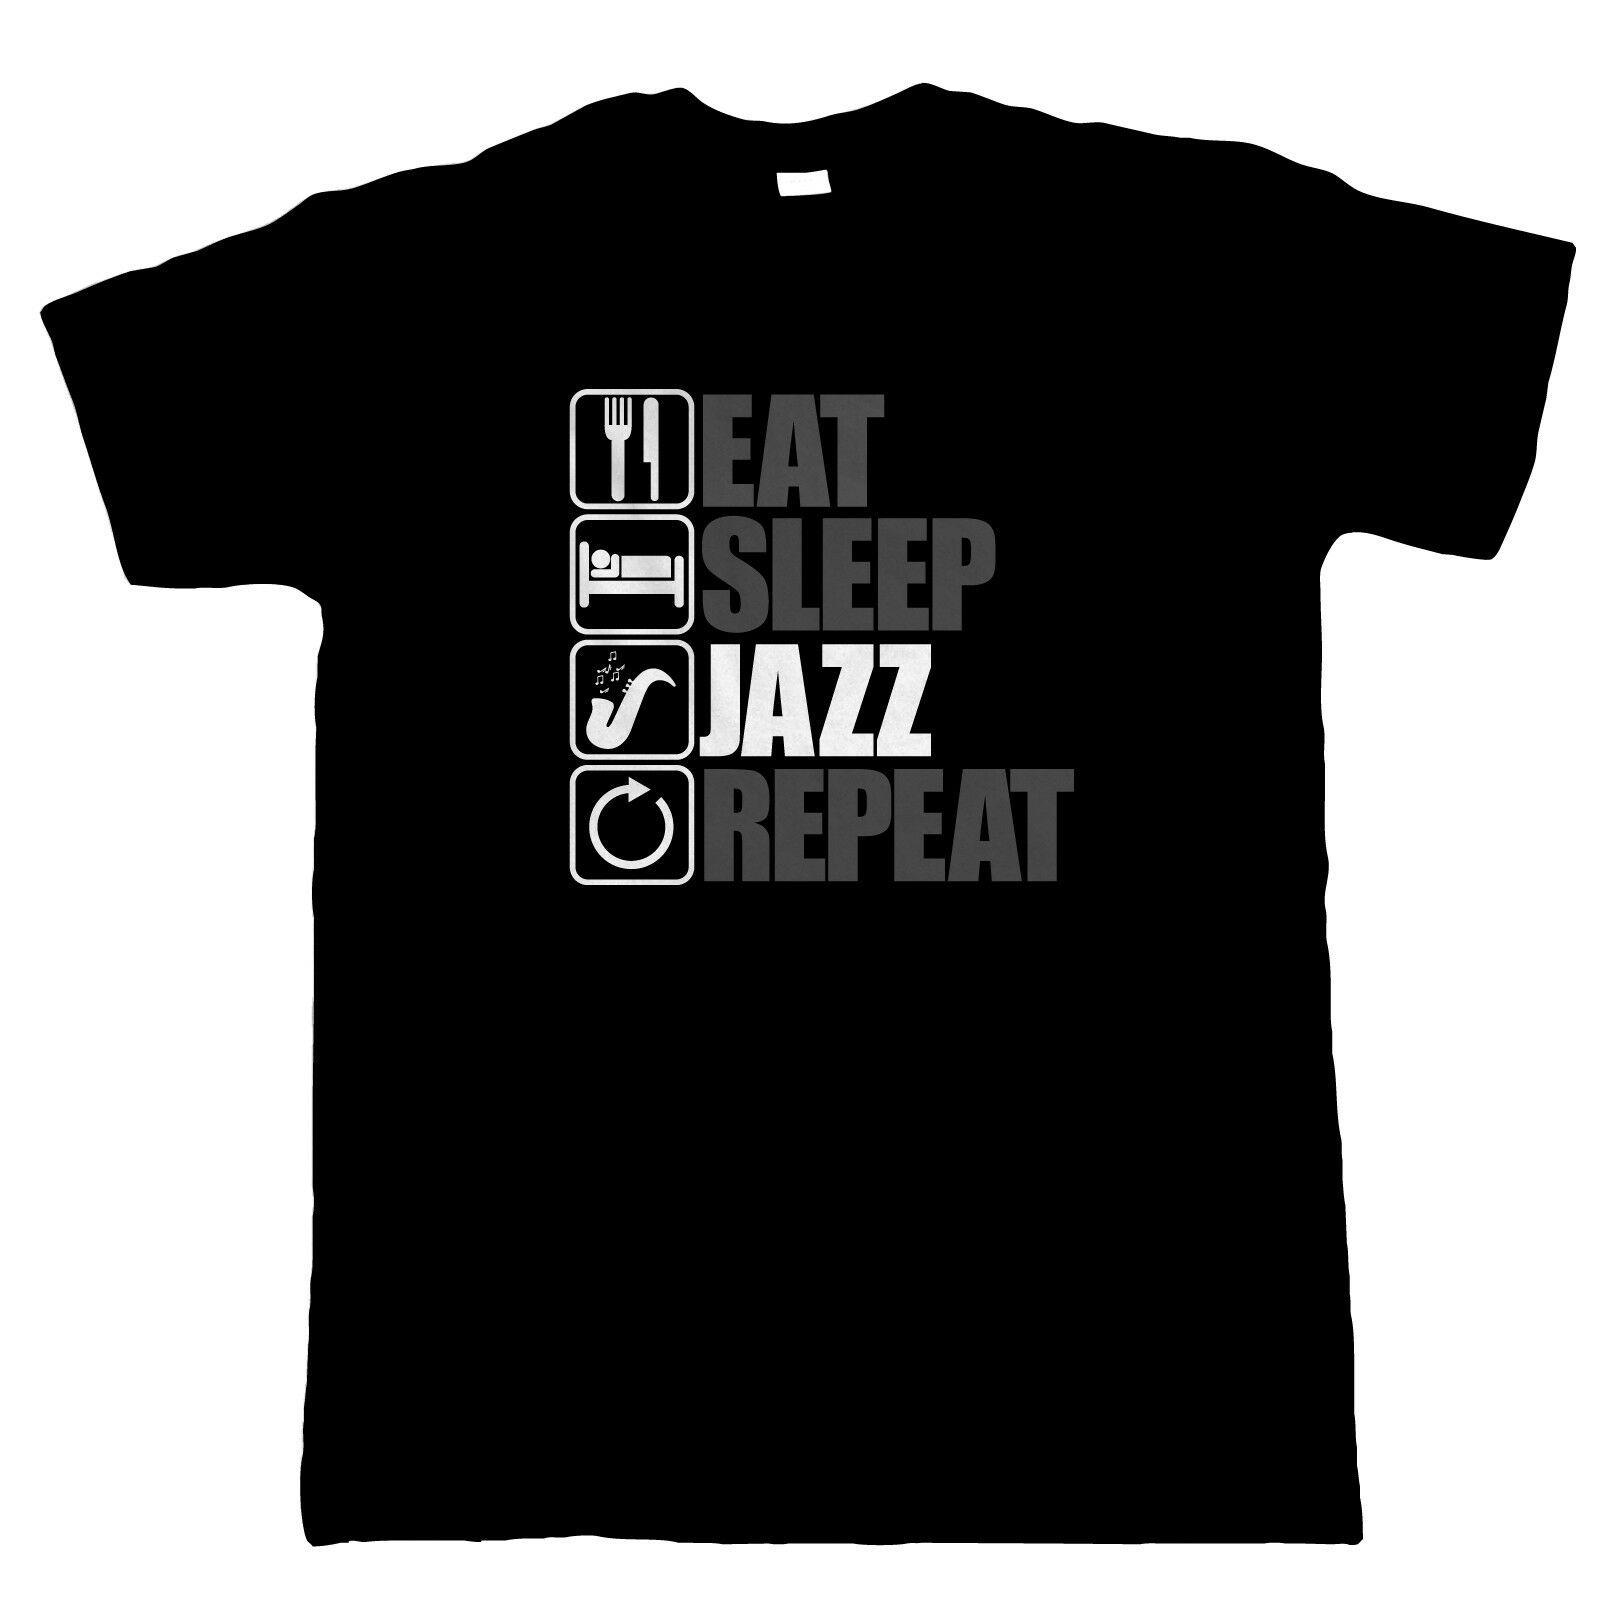 Eat Sleep Jazz Ripetere, Mens divertente Music T Shirt, regalo papà cime 2019 Breve shirt Hip Hop Starnger cose poliestere T Shirt